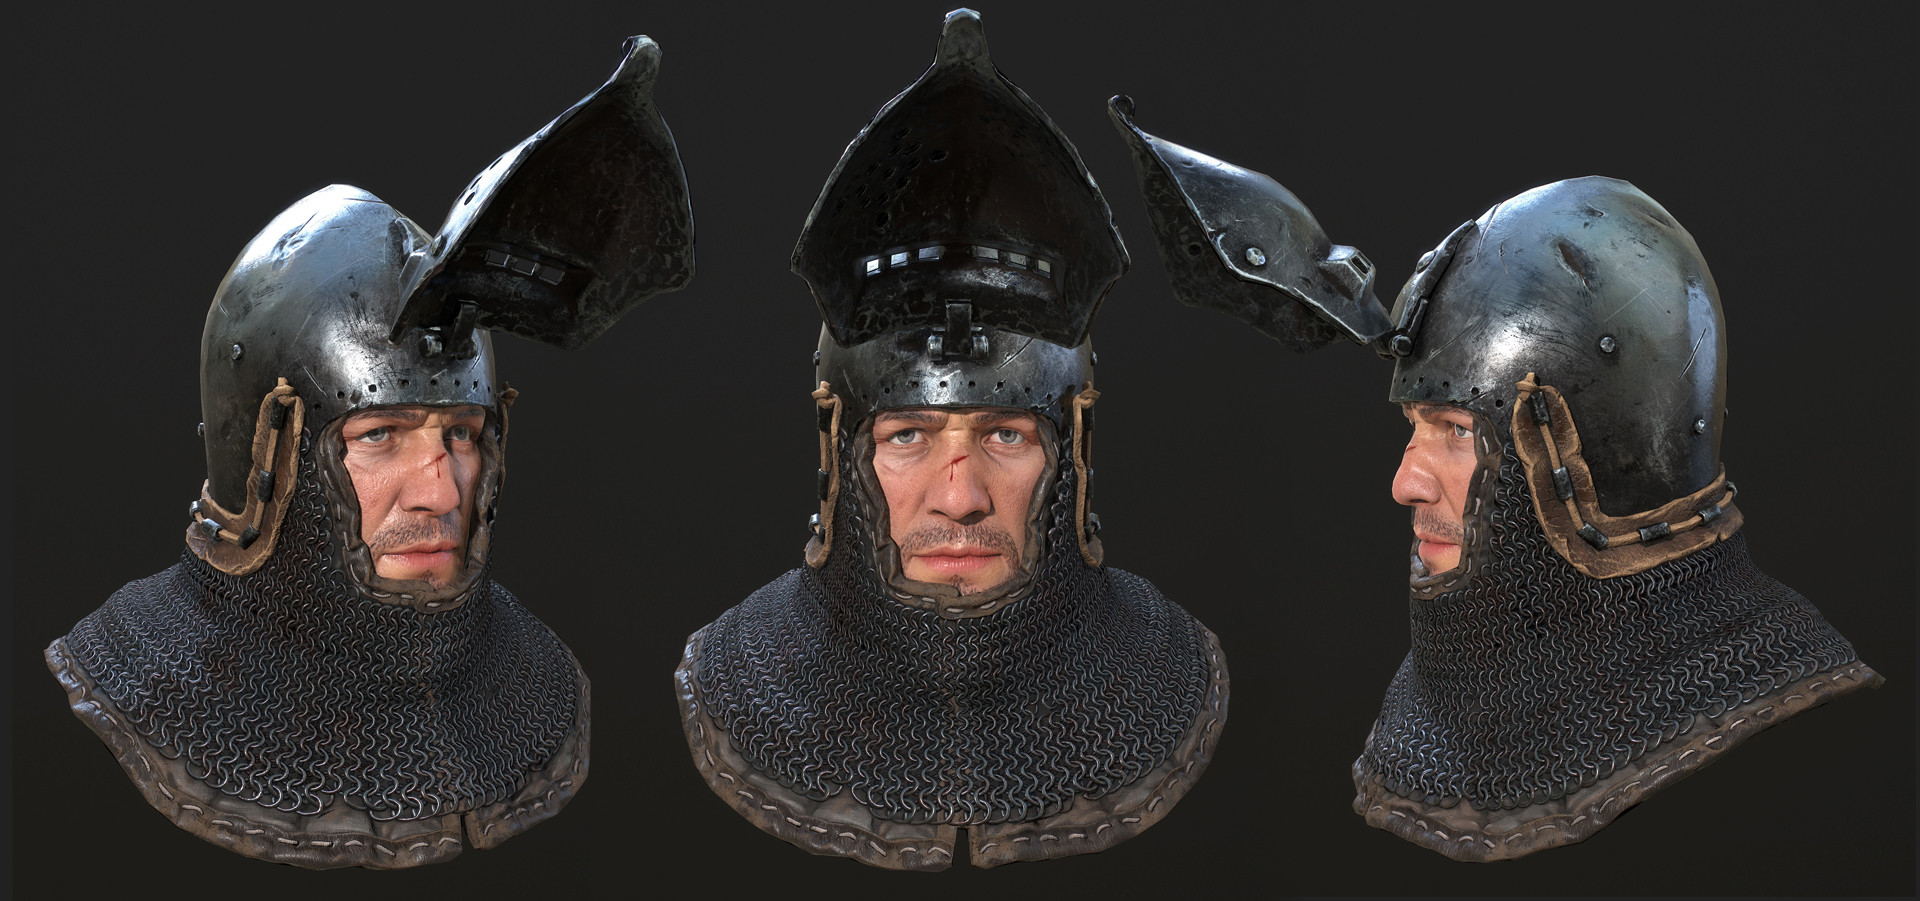 Petr sokolov artpity knight lp face close